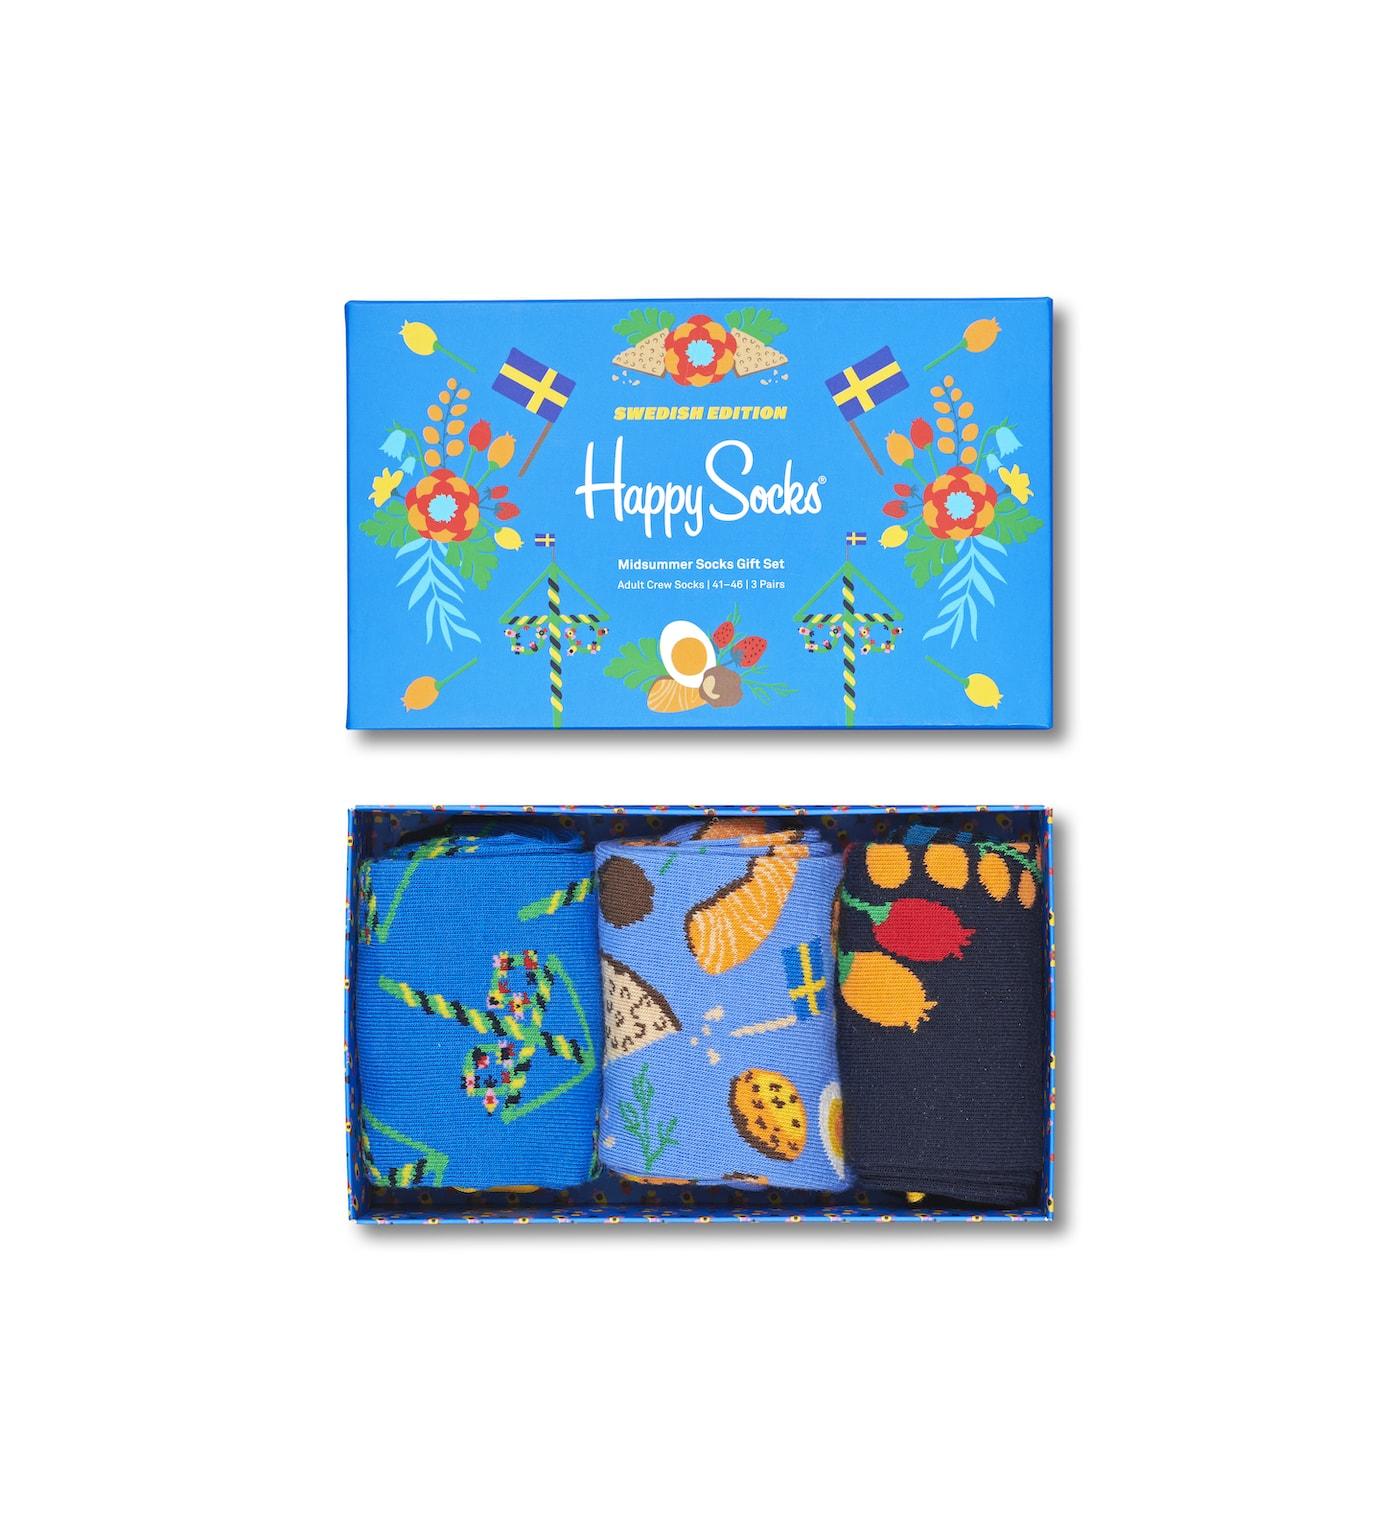 Mittsommer, Midsummer, Midsommar, Happy Socks, Schweden, Mittsommer-Dekoration